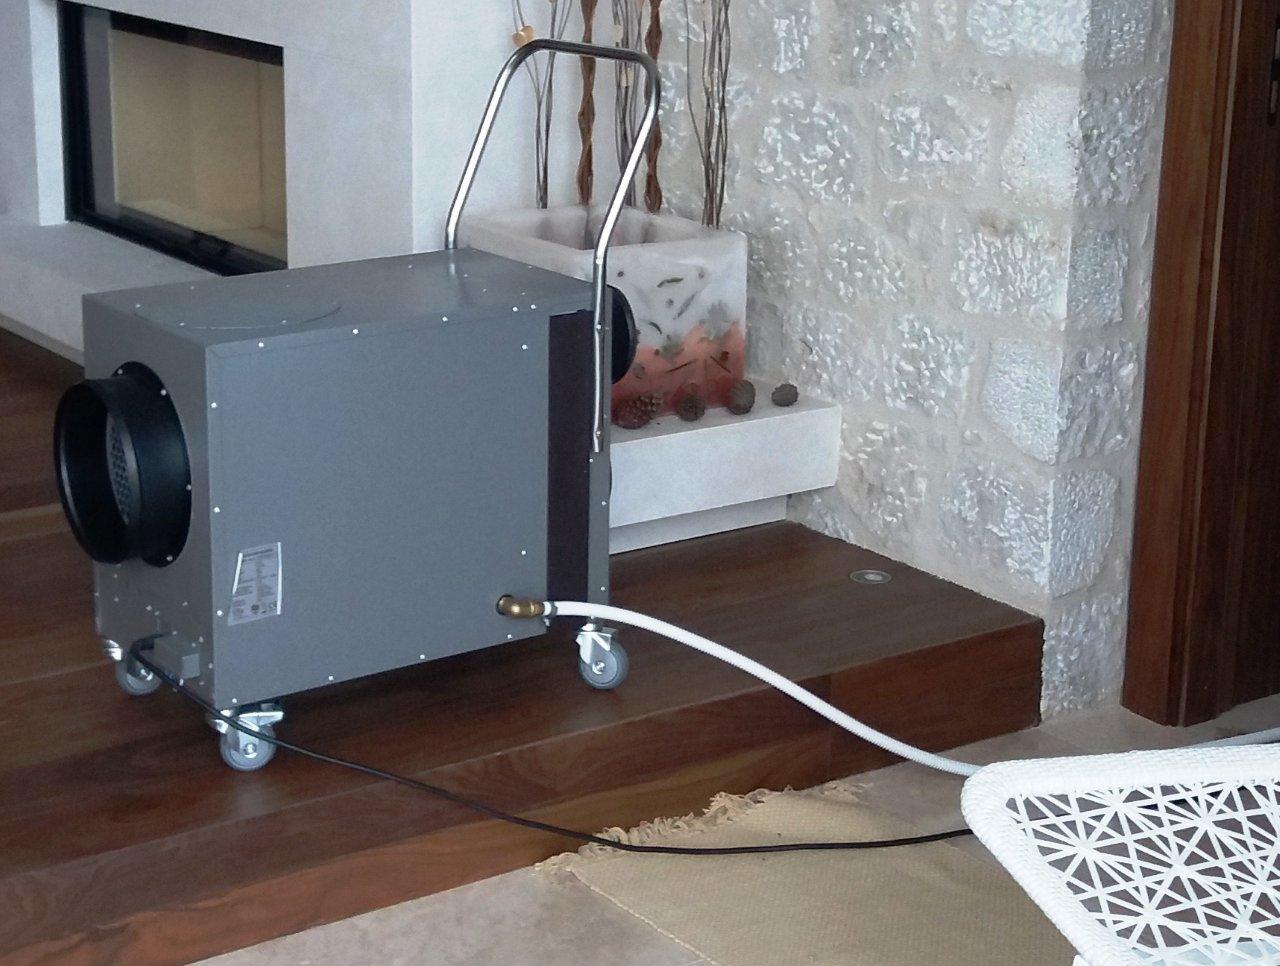 Heat recovery ventilator ebay - Stand Alone